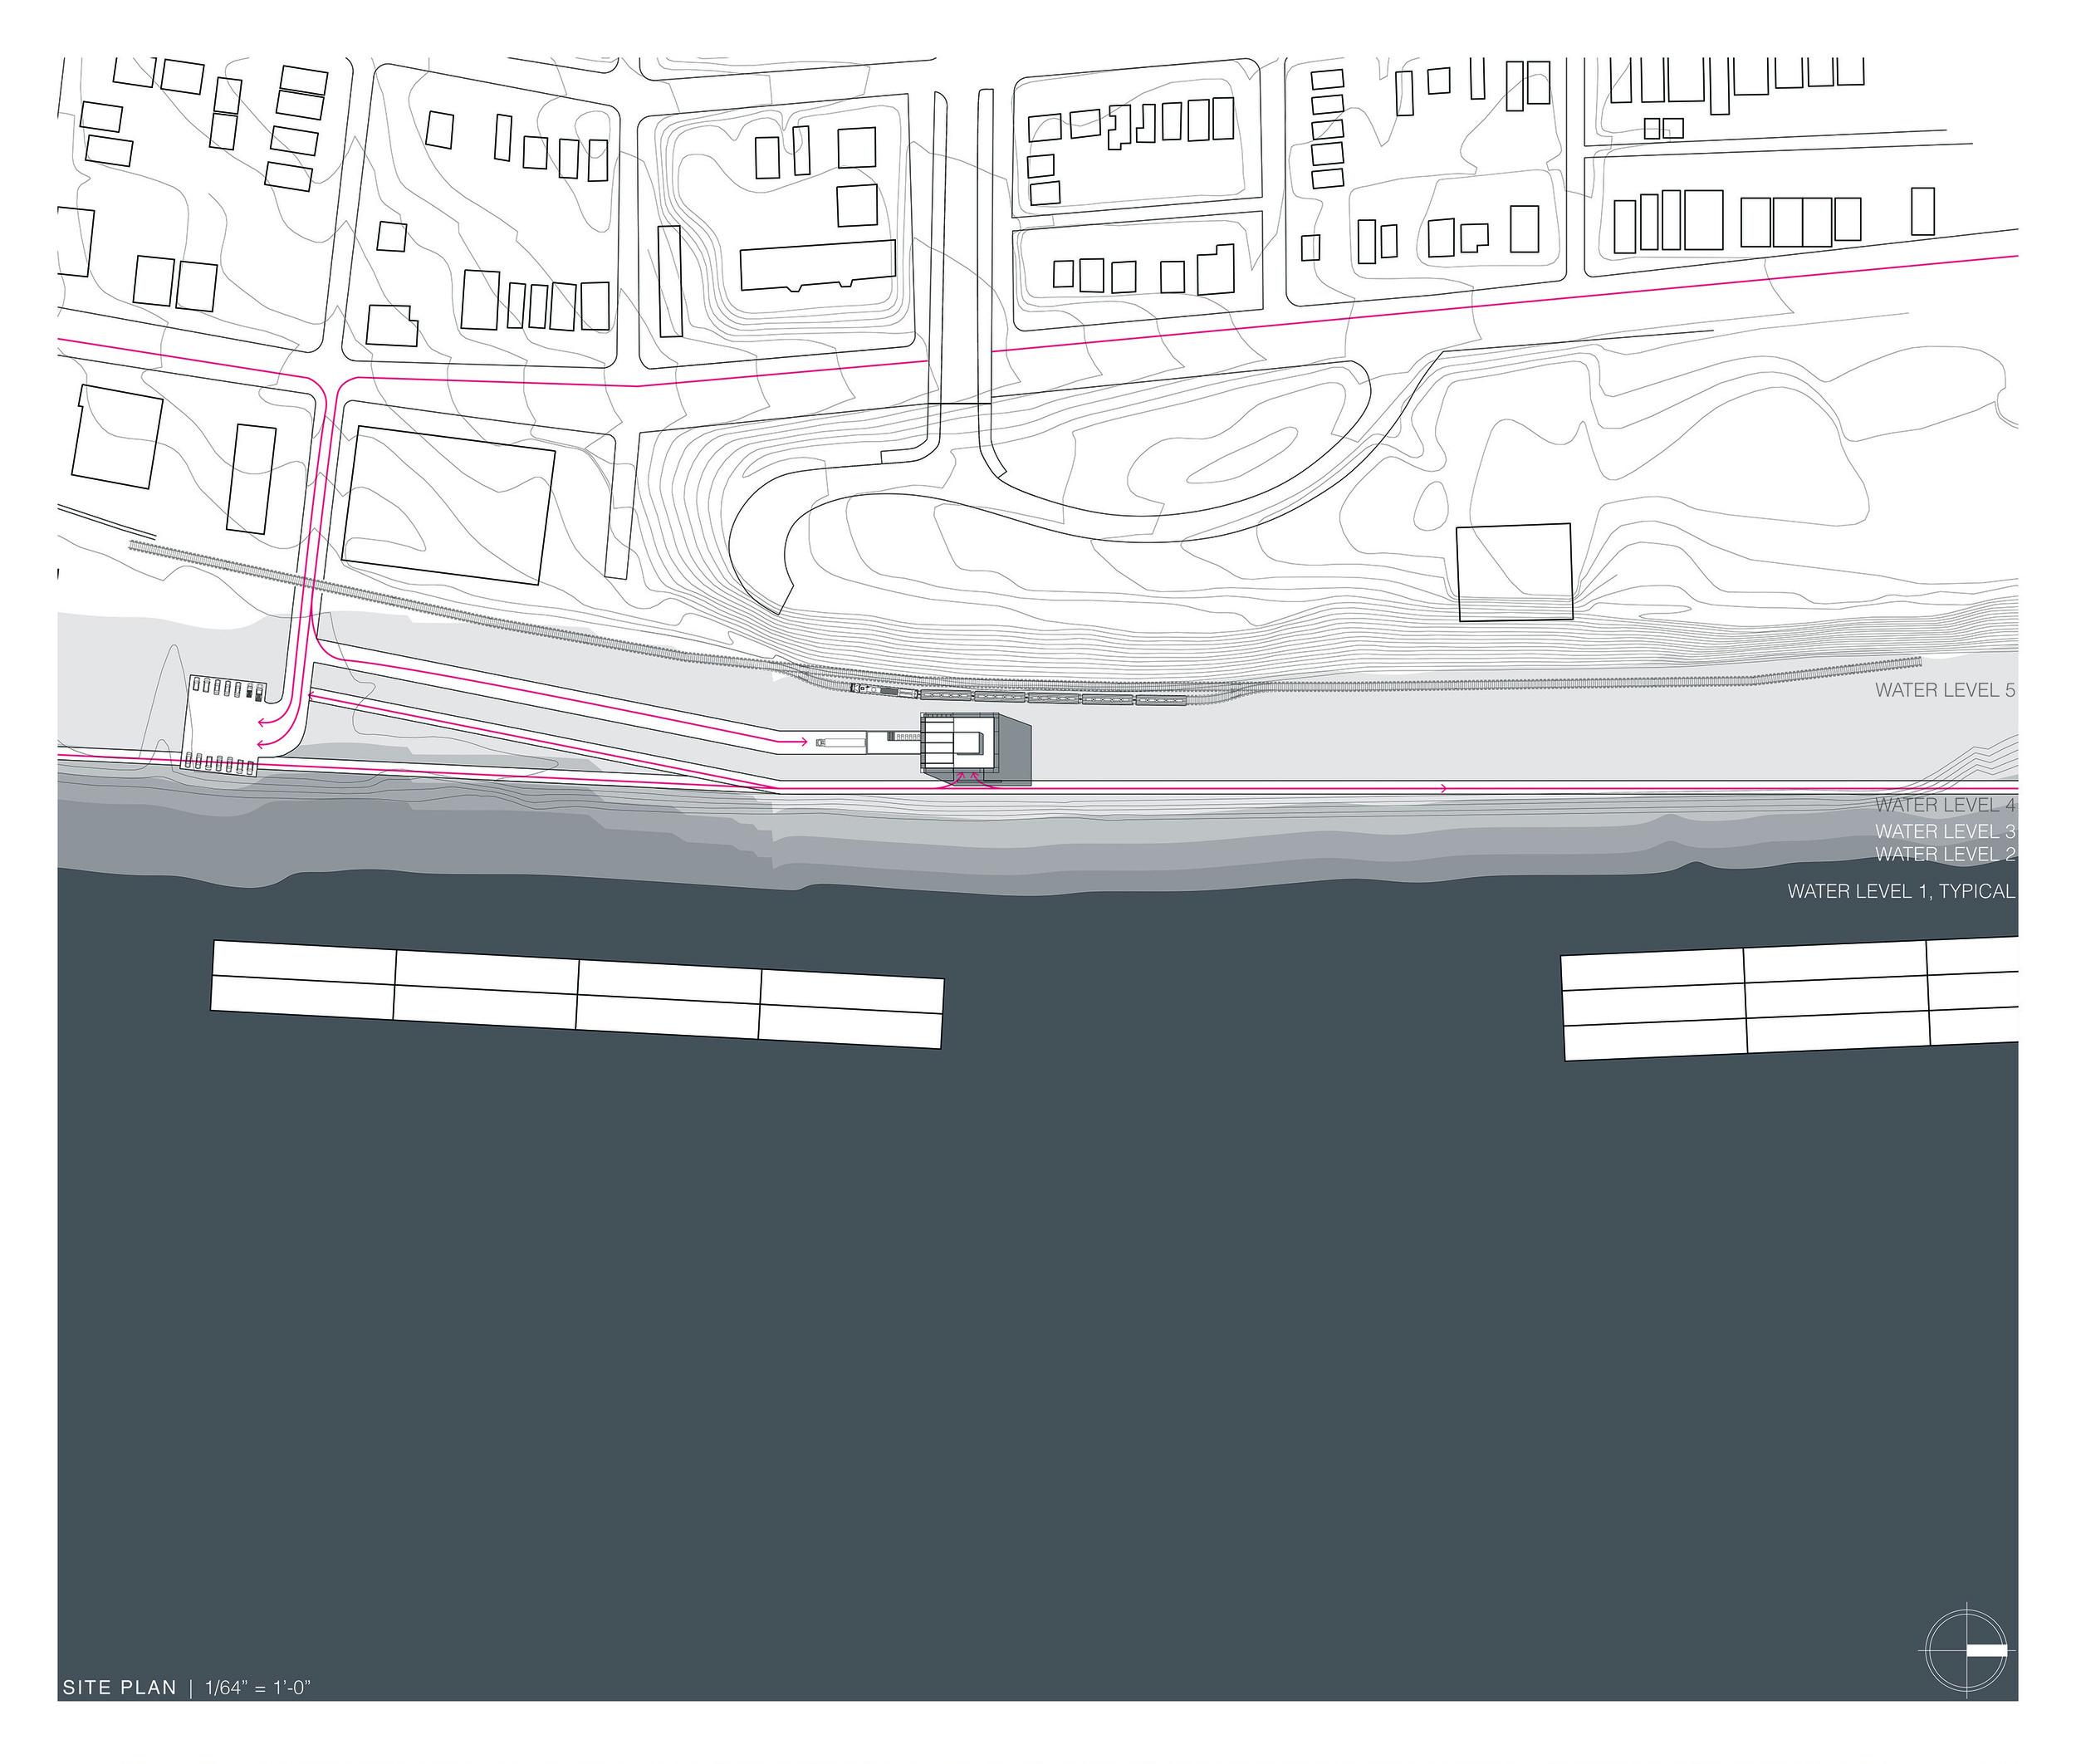 04_Vertical_Brewery_Alejandra_Fernandez_Location_Plan_along_Mississippi_River.jpg